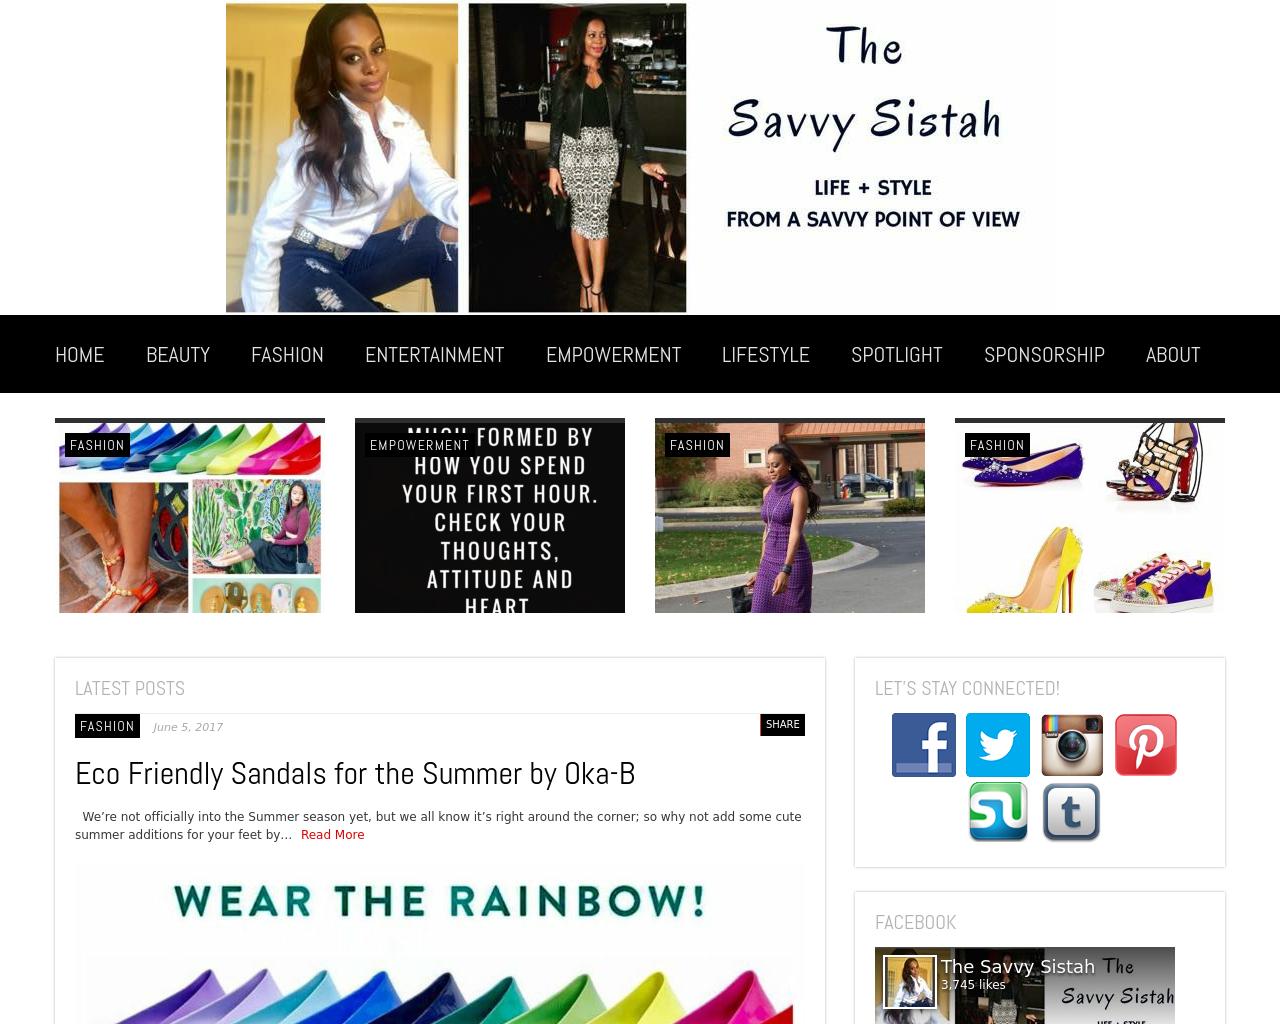 The-Savvy-Sistah-Advertising-Reviews-Pricing